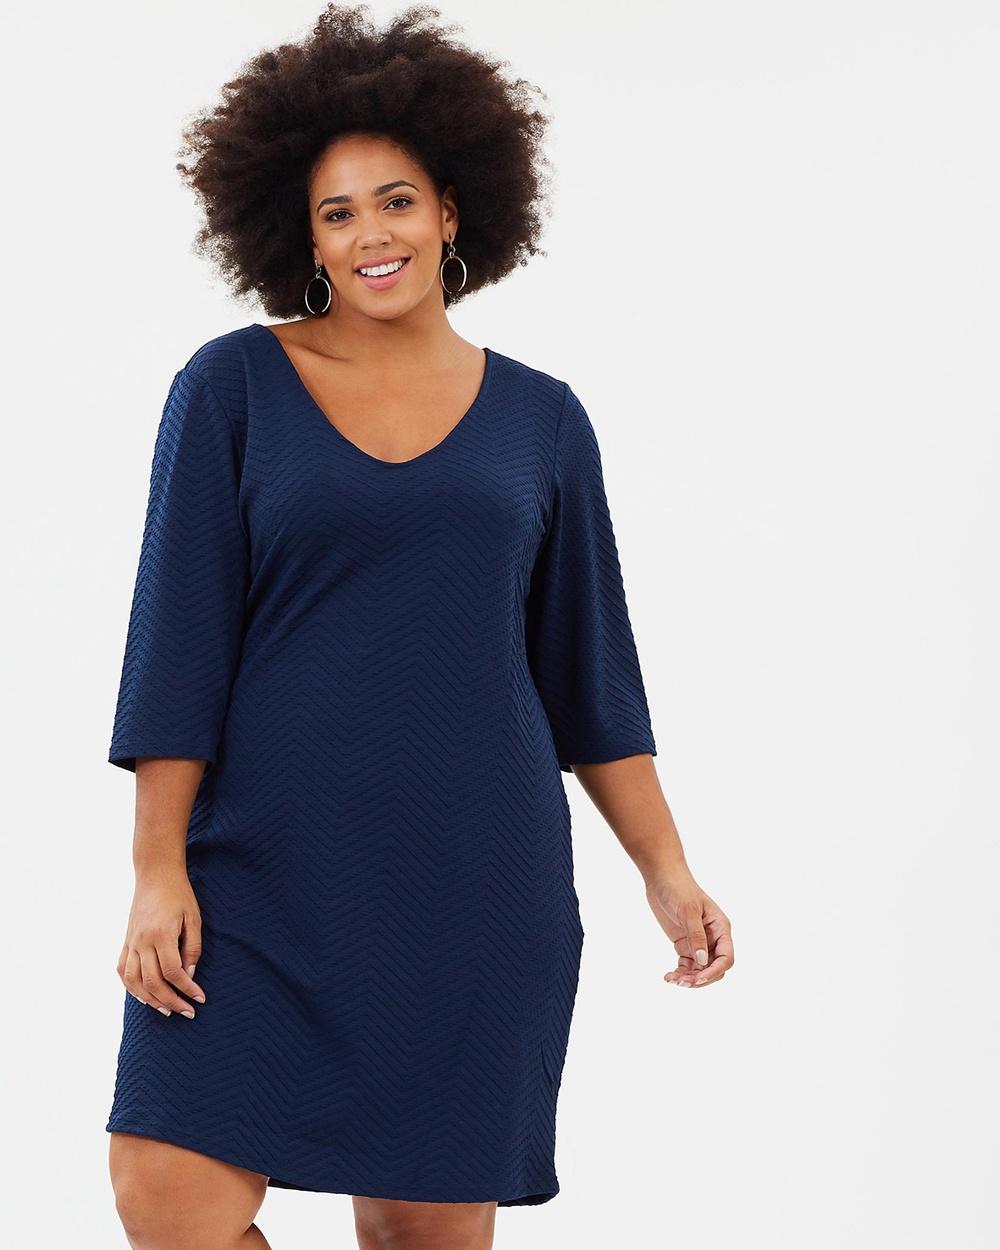 JUNAROSE 3 4 Sleeve Dress Dresses Navy Blazer 3-4 Sleeve Dress